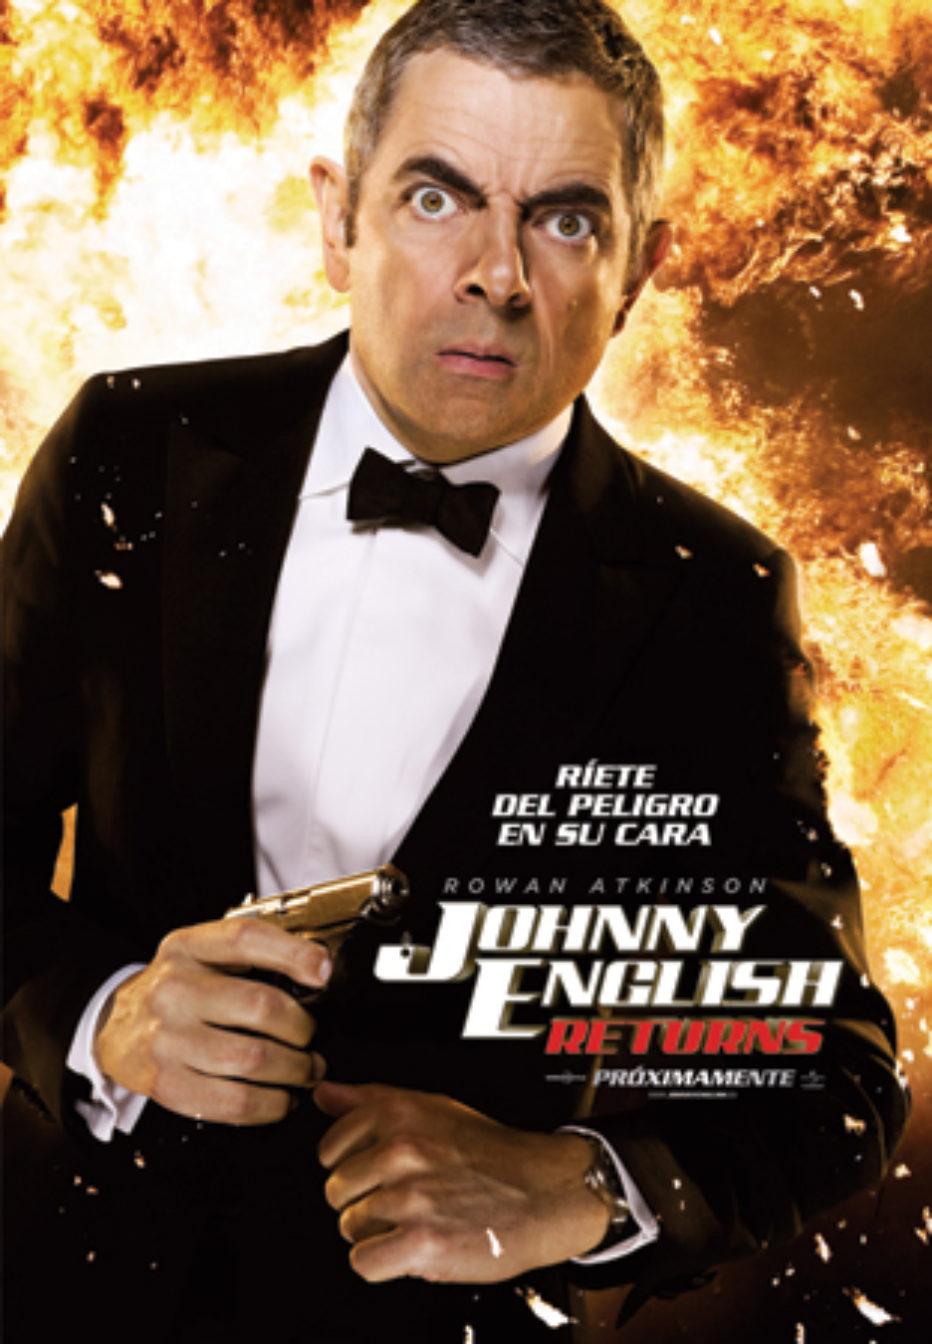 Johnny English Returns, para gustos, películas